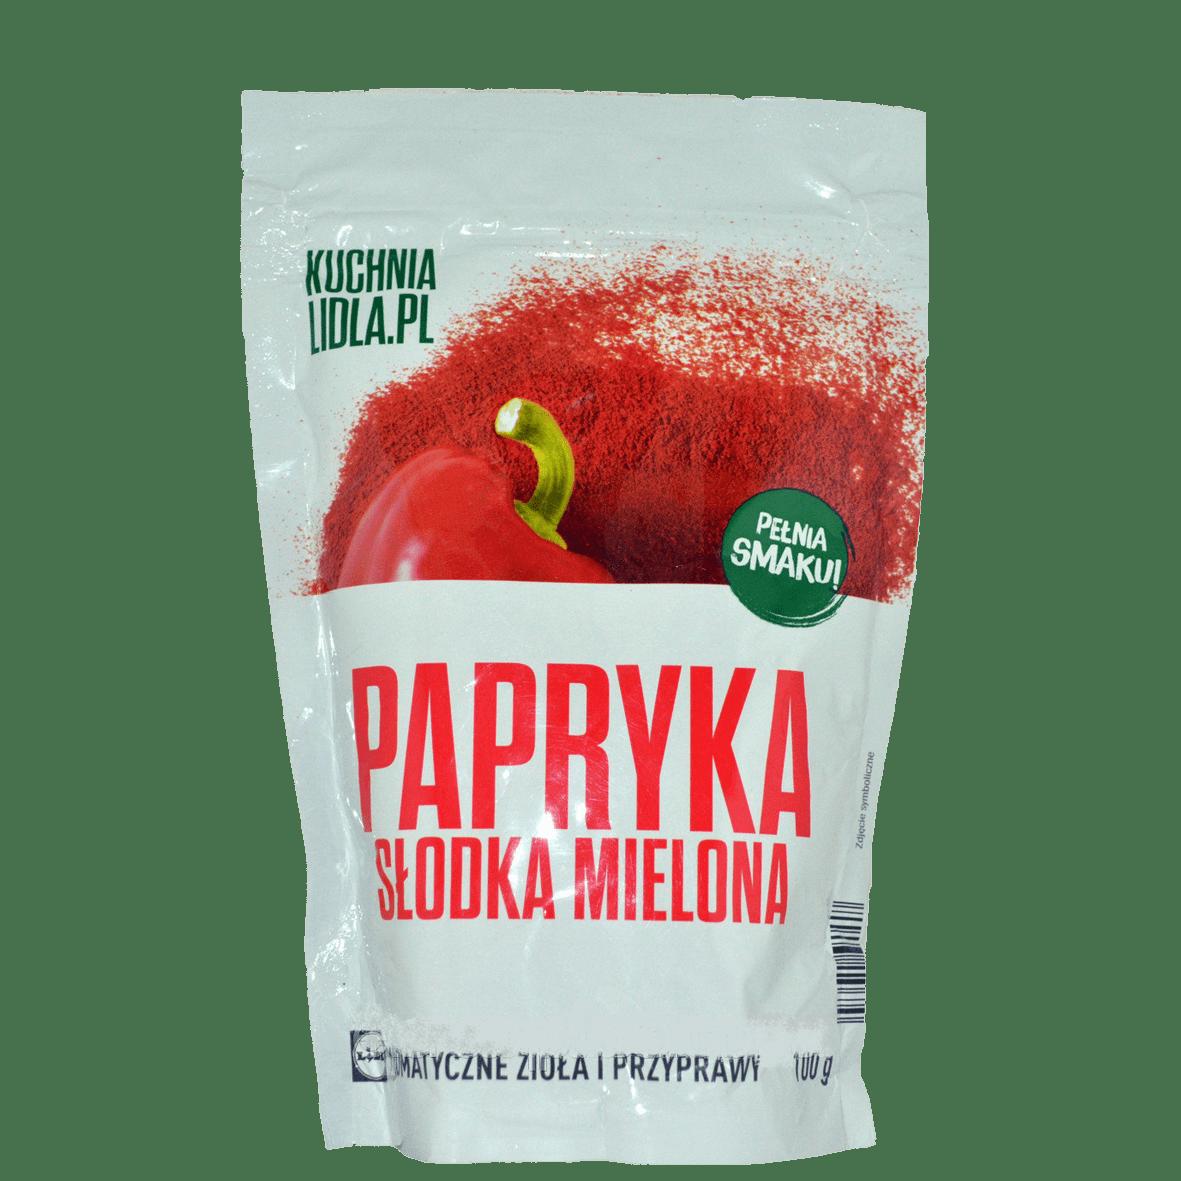 Приправа Kuchnia Lidla.pl Papryka slodka mielona 100g